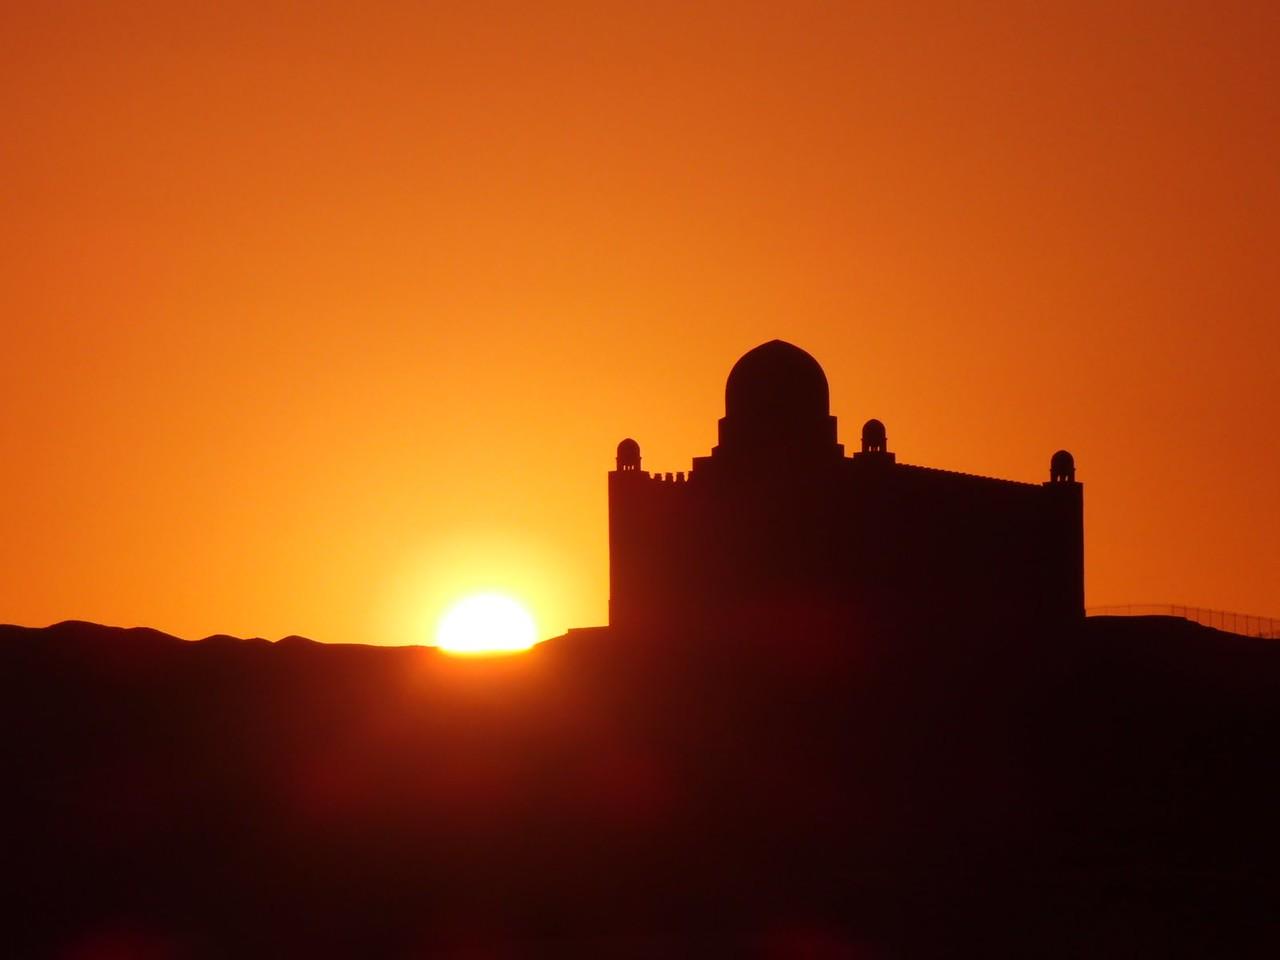 Sunrise at the Aga Khan Mausoleum, Aswan, Egypt